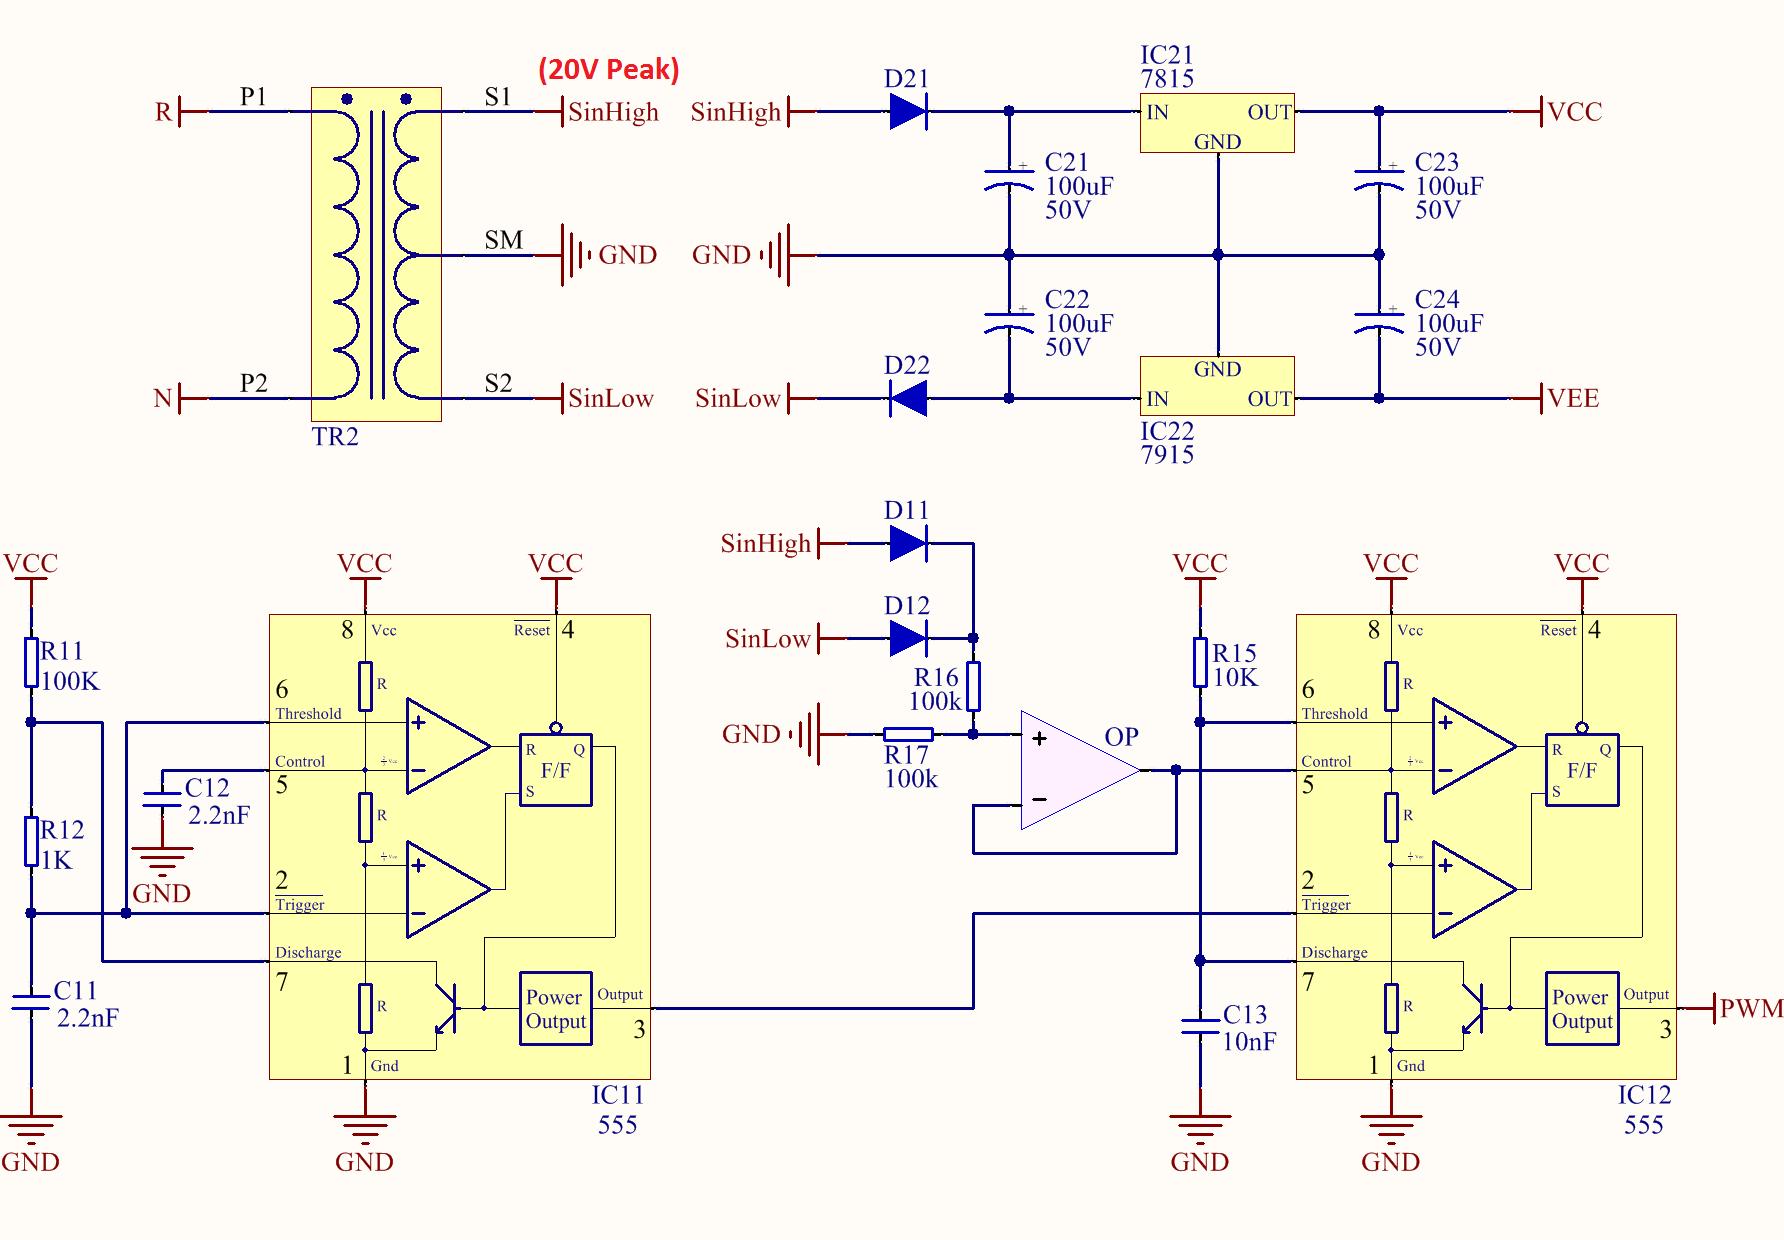 Alumacar Schematic Wiring Diagram 48v Electrical Diagrams Dmx Control Free Download Ac Residential Symbols U2022 Identifying Circuits